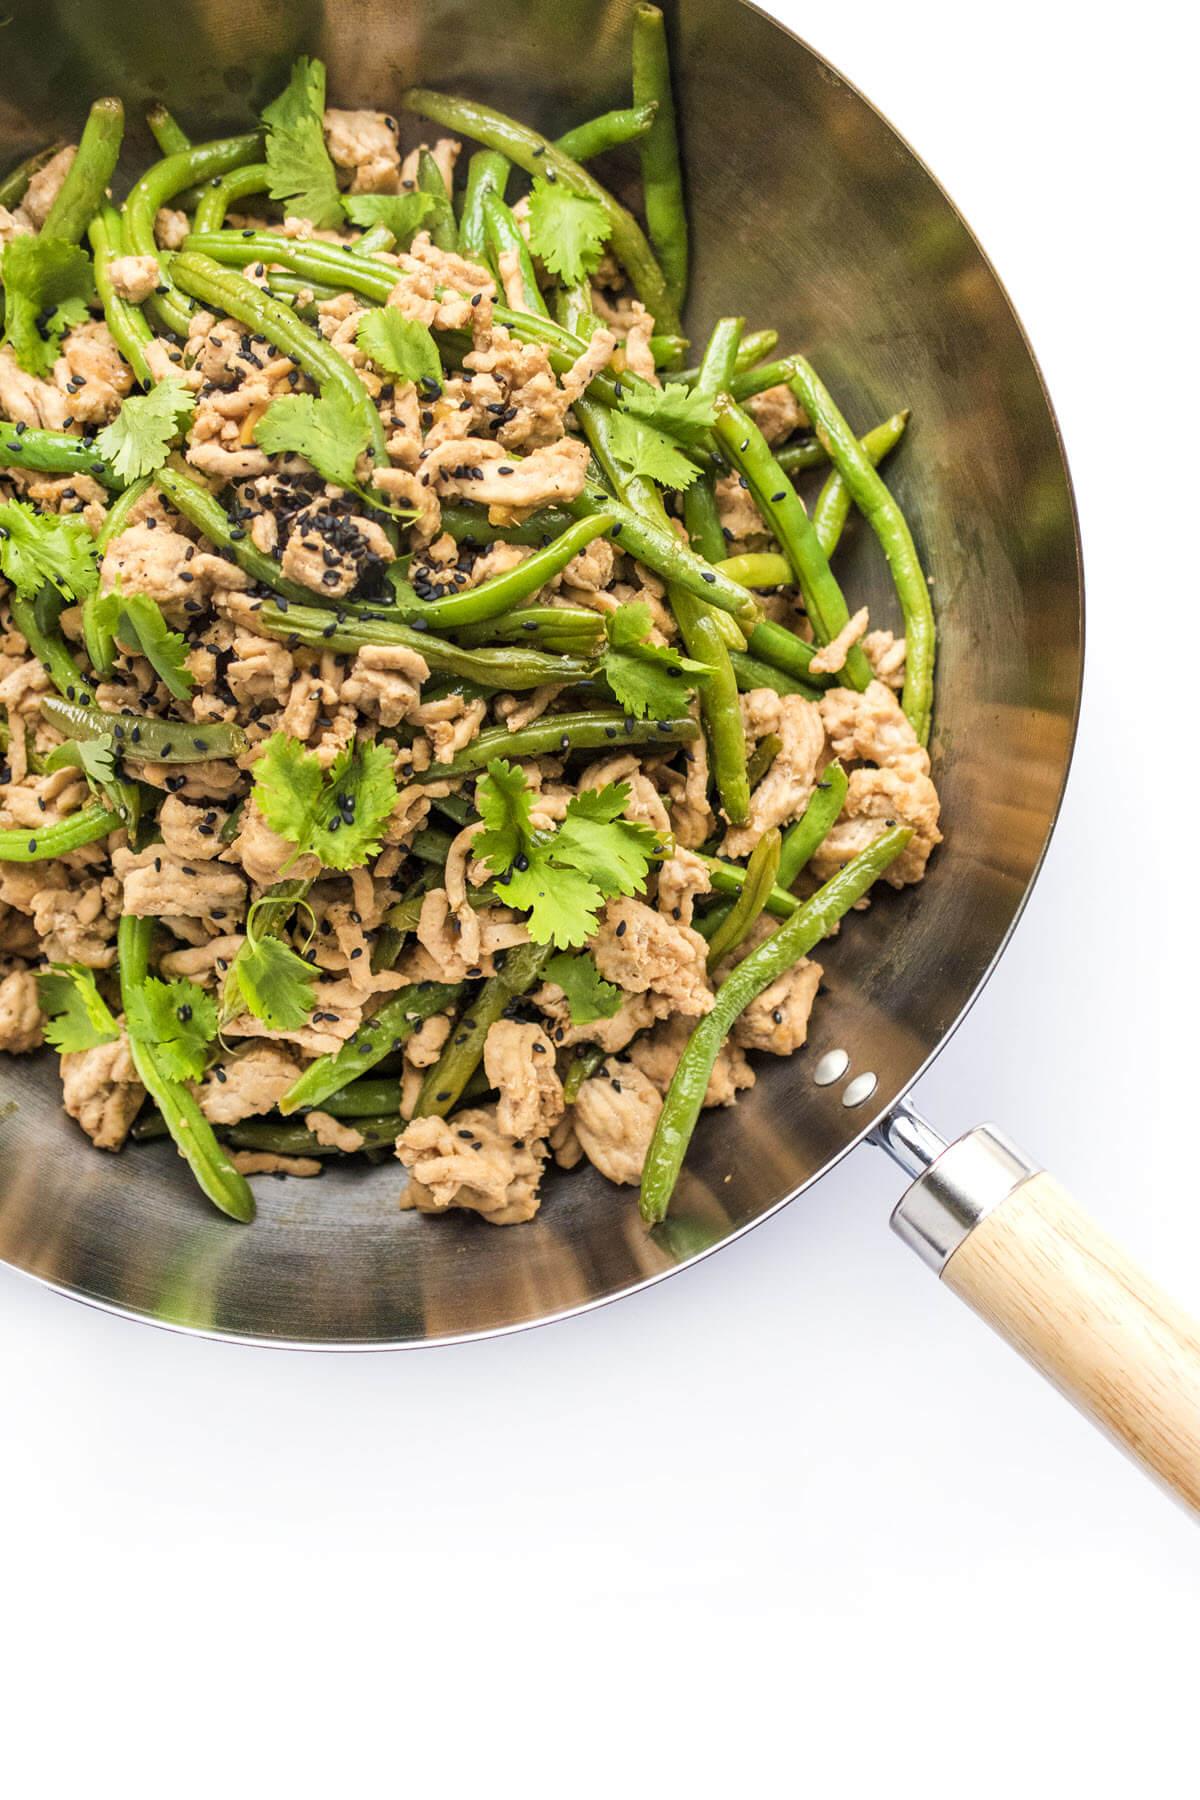 Szechuan Ground Turkey and Green Beans in a pan